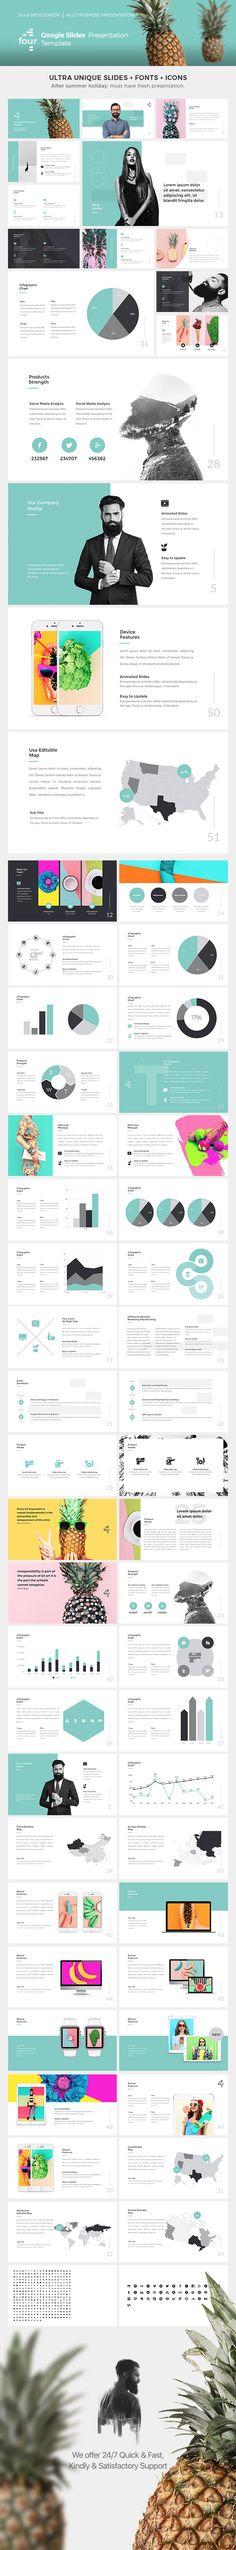 Universe PowerPoint Presentation - powerpoint brochure template